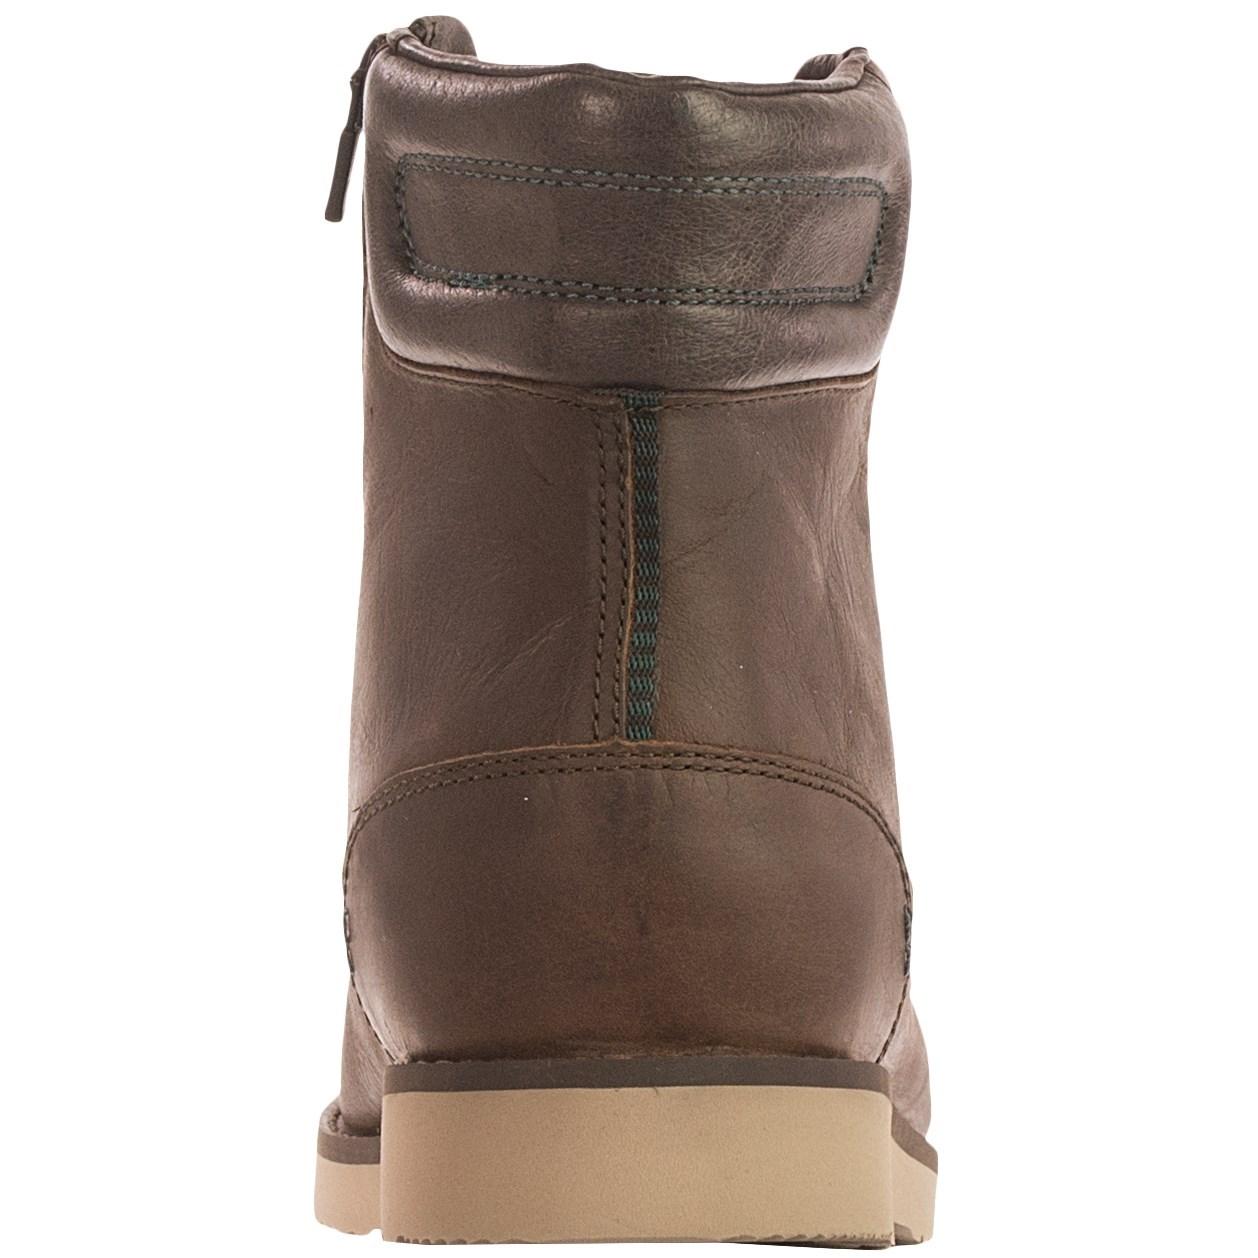 Ugg Boots Durban